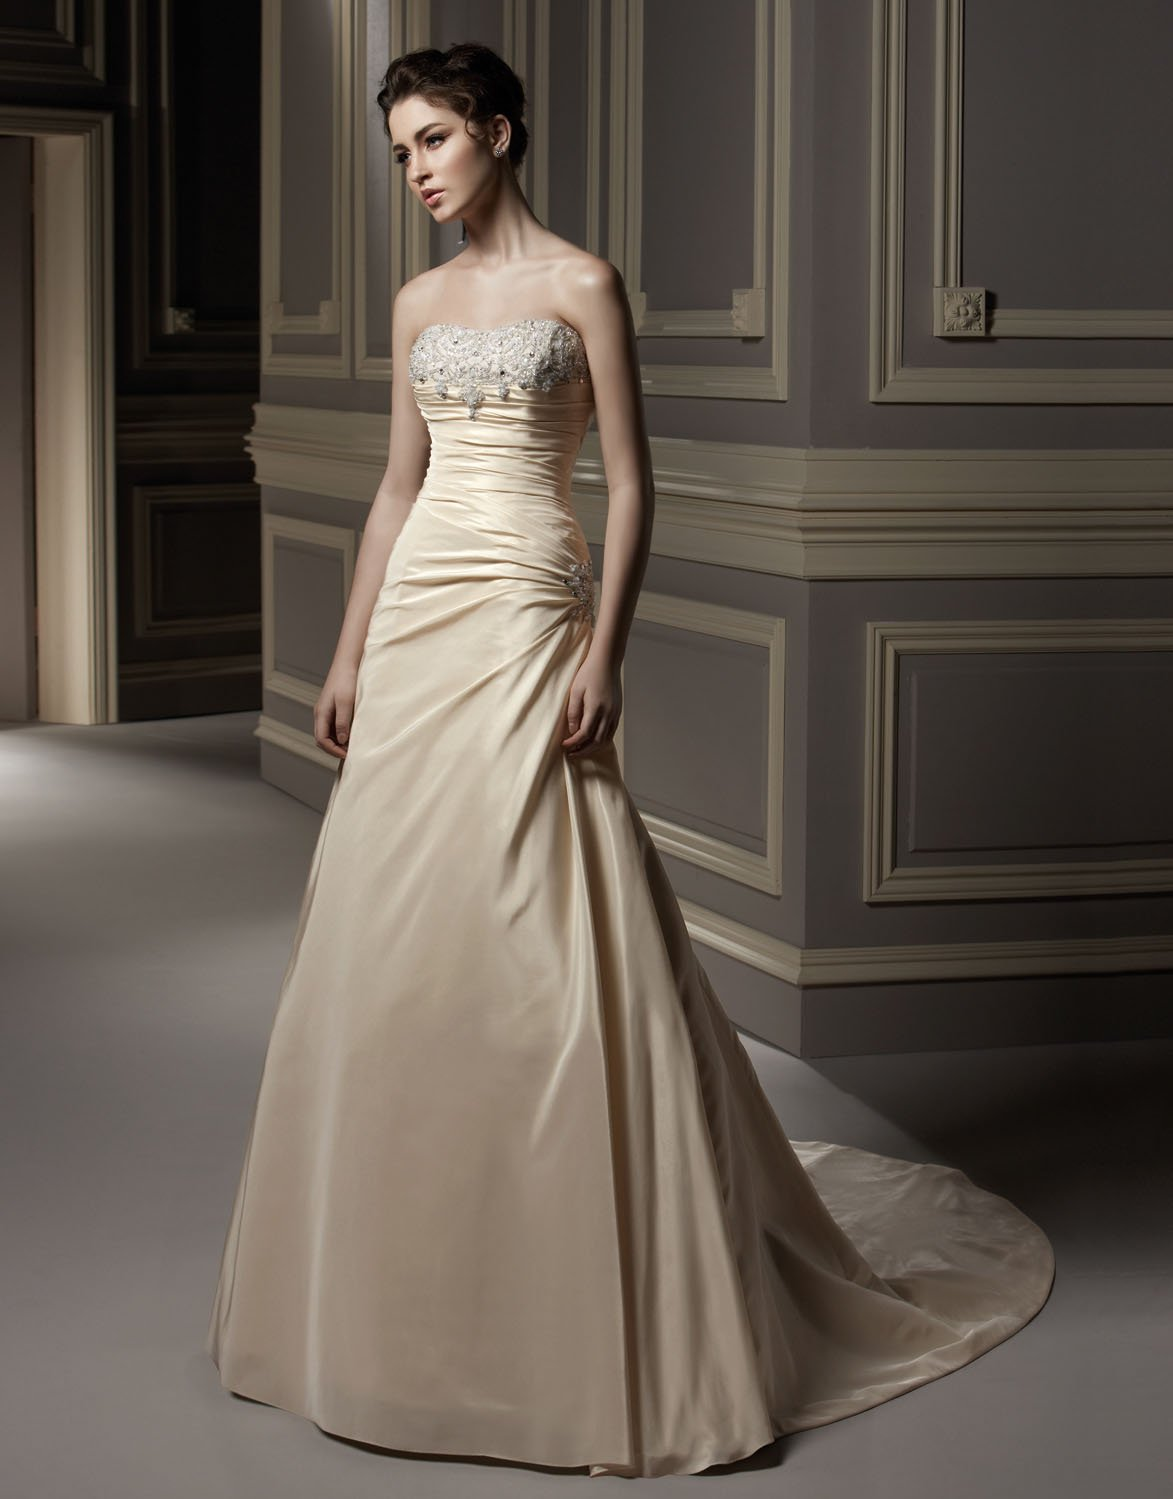 Scoop Neckline Strapless Appliqued Beading Taffeta Wedding Dress Bridal Gown aq0034